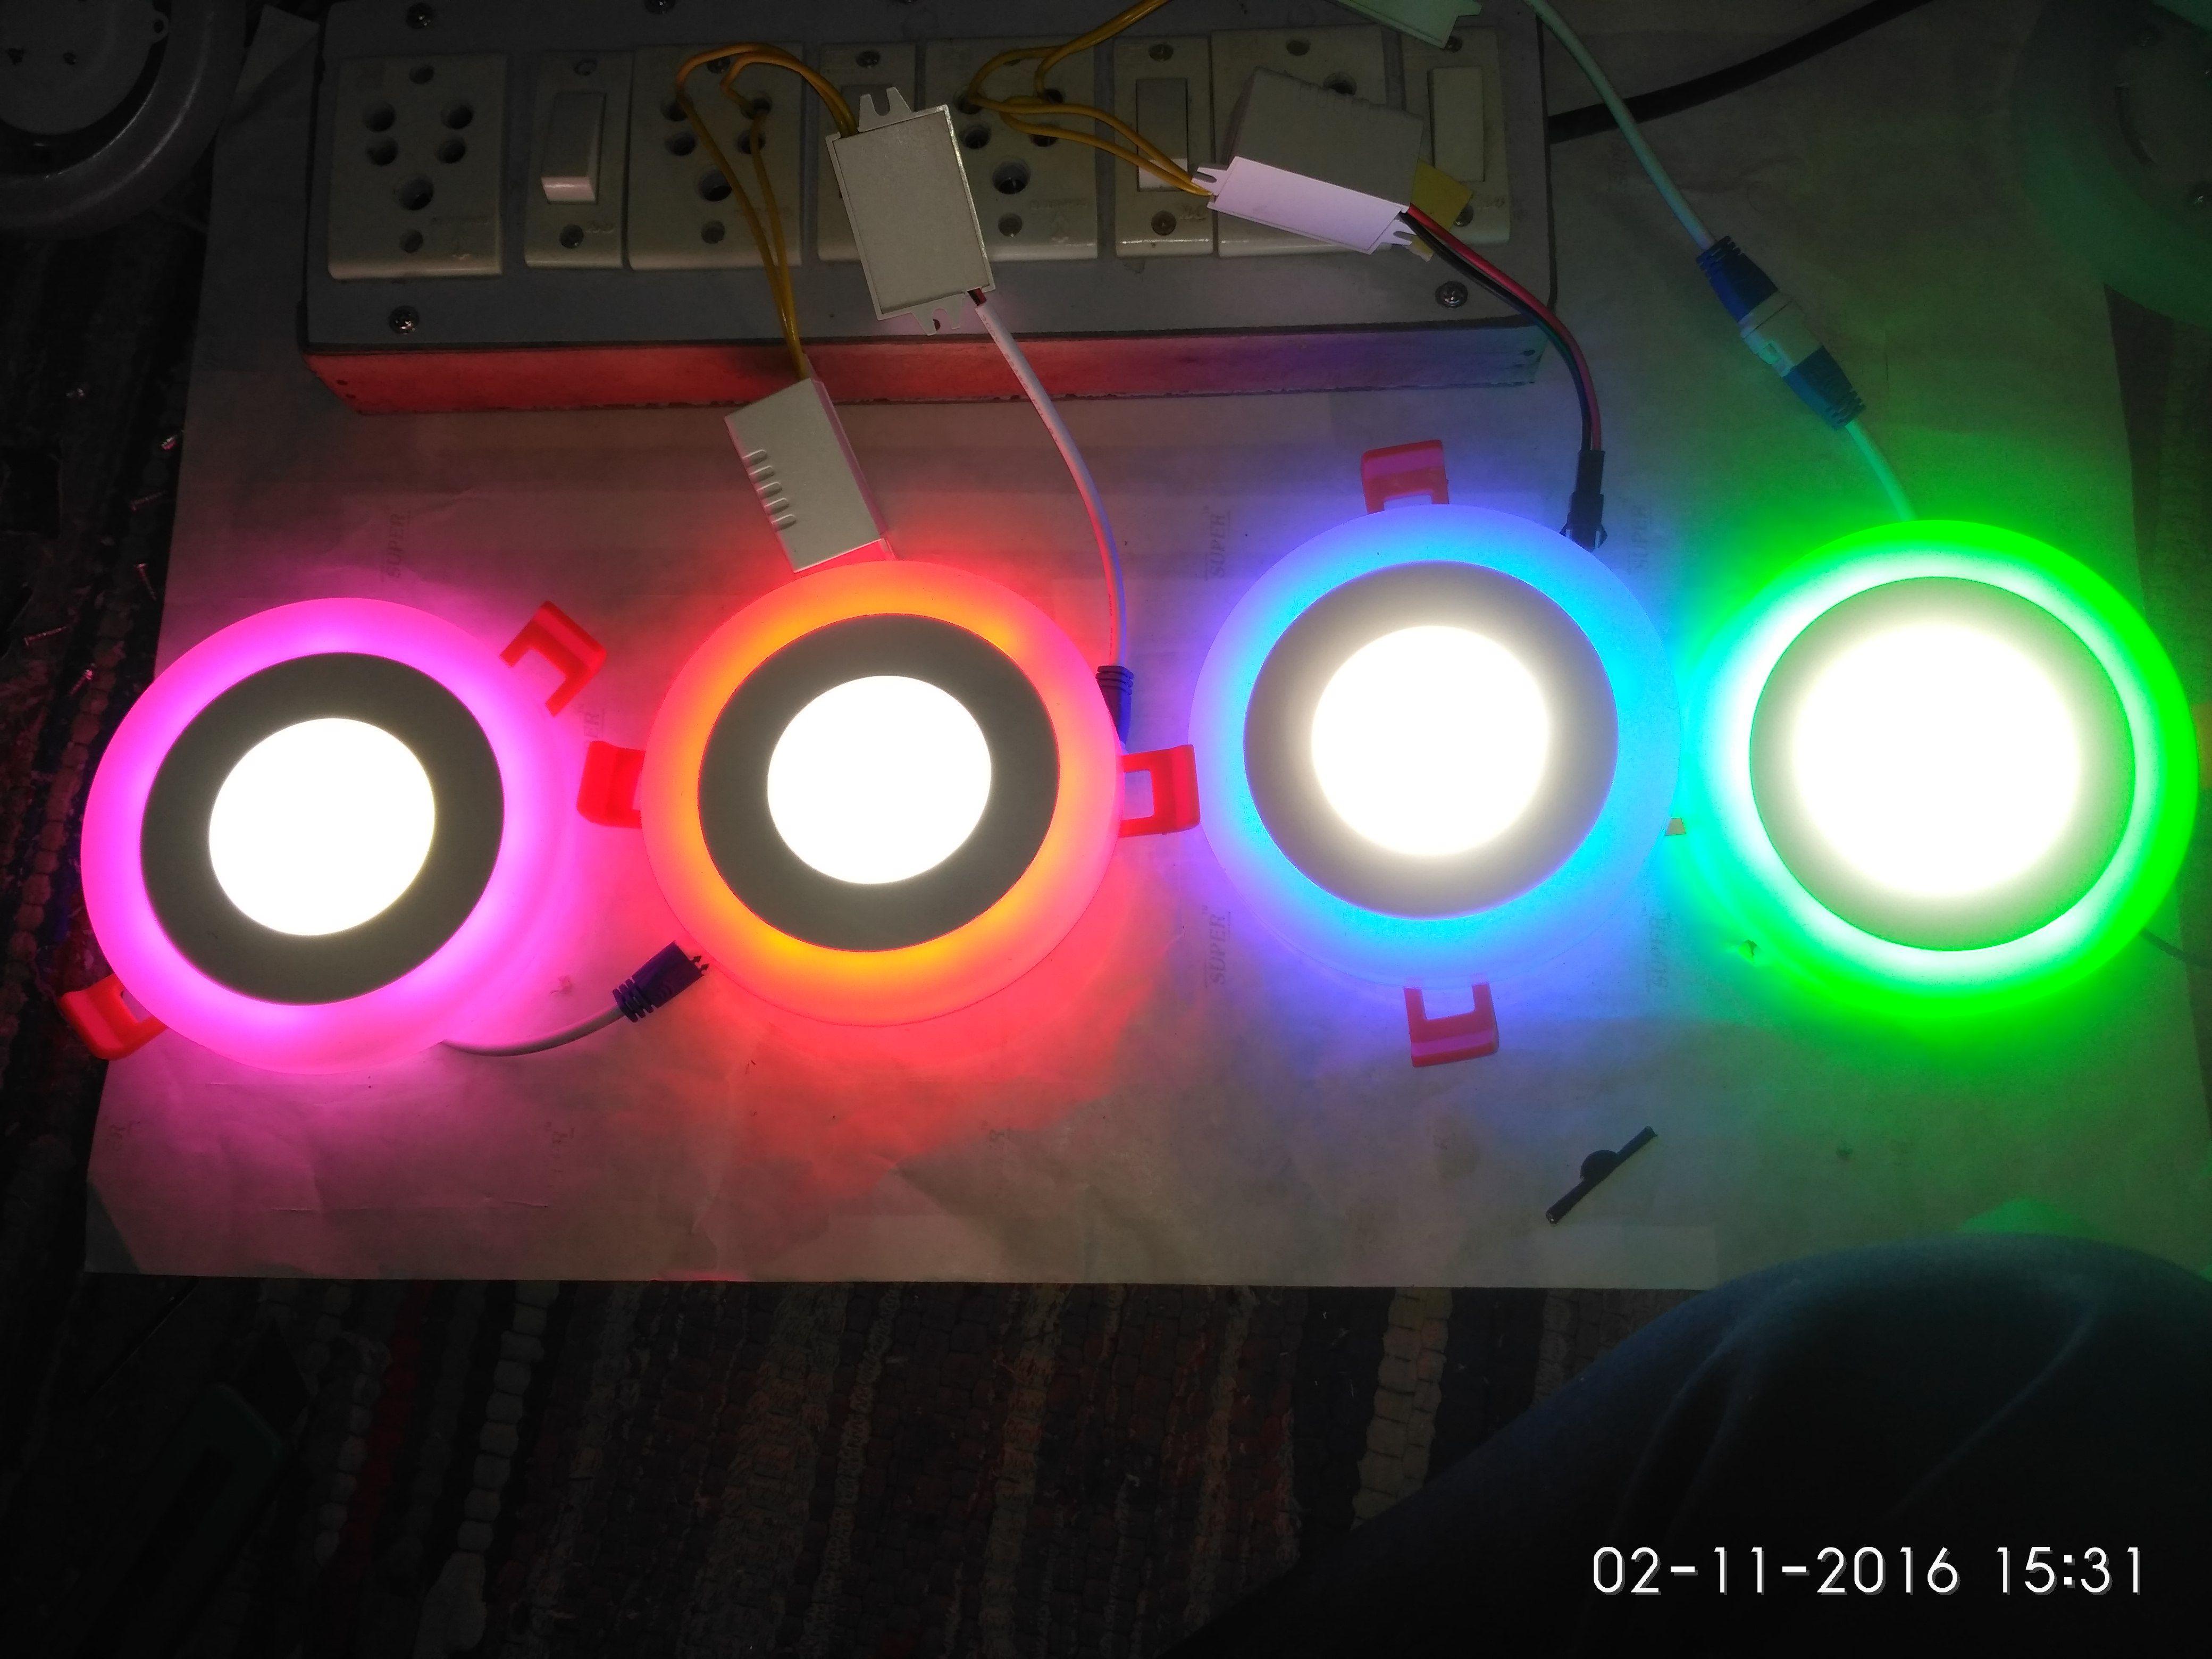 VMEX VIBRANT LED PANEL ROUND 8290264078 | LED PANEL | Pinterest ...